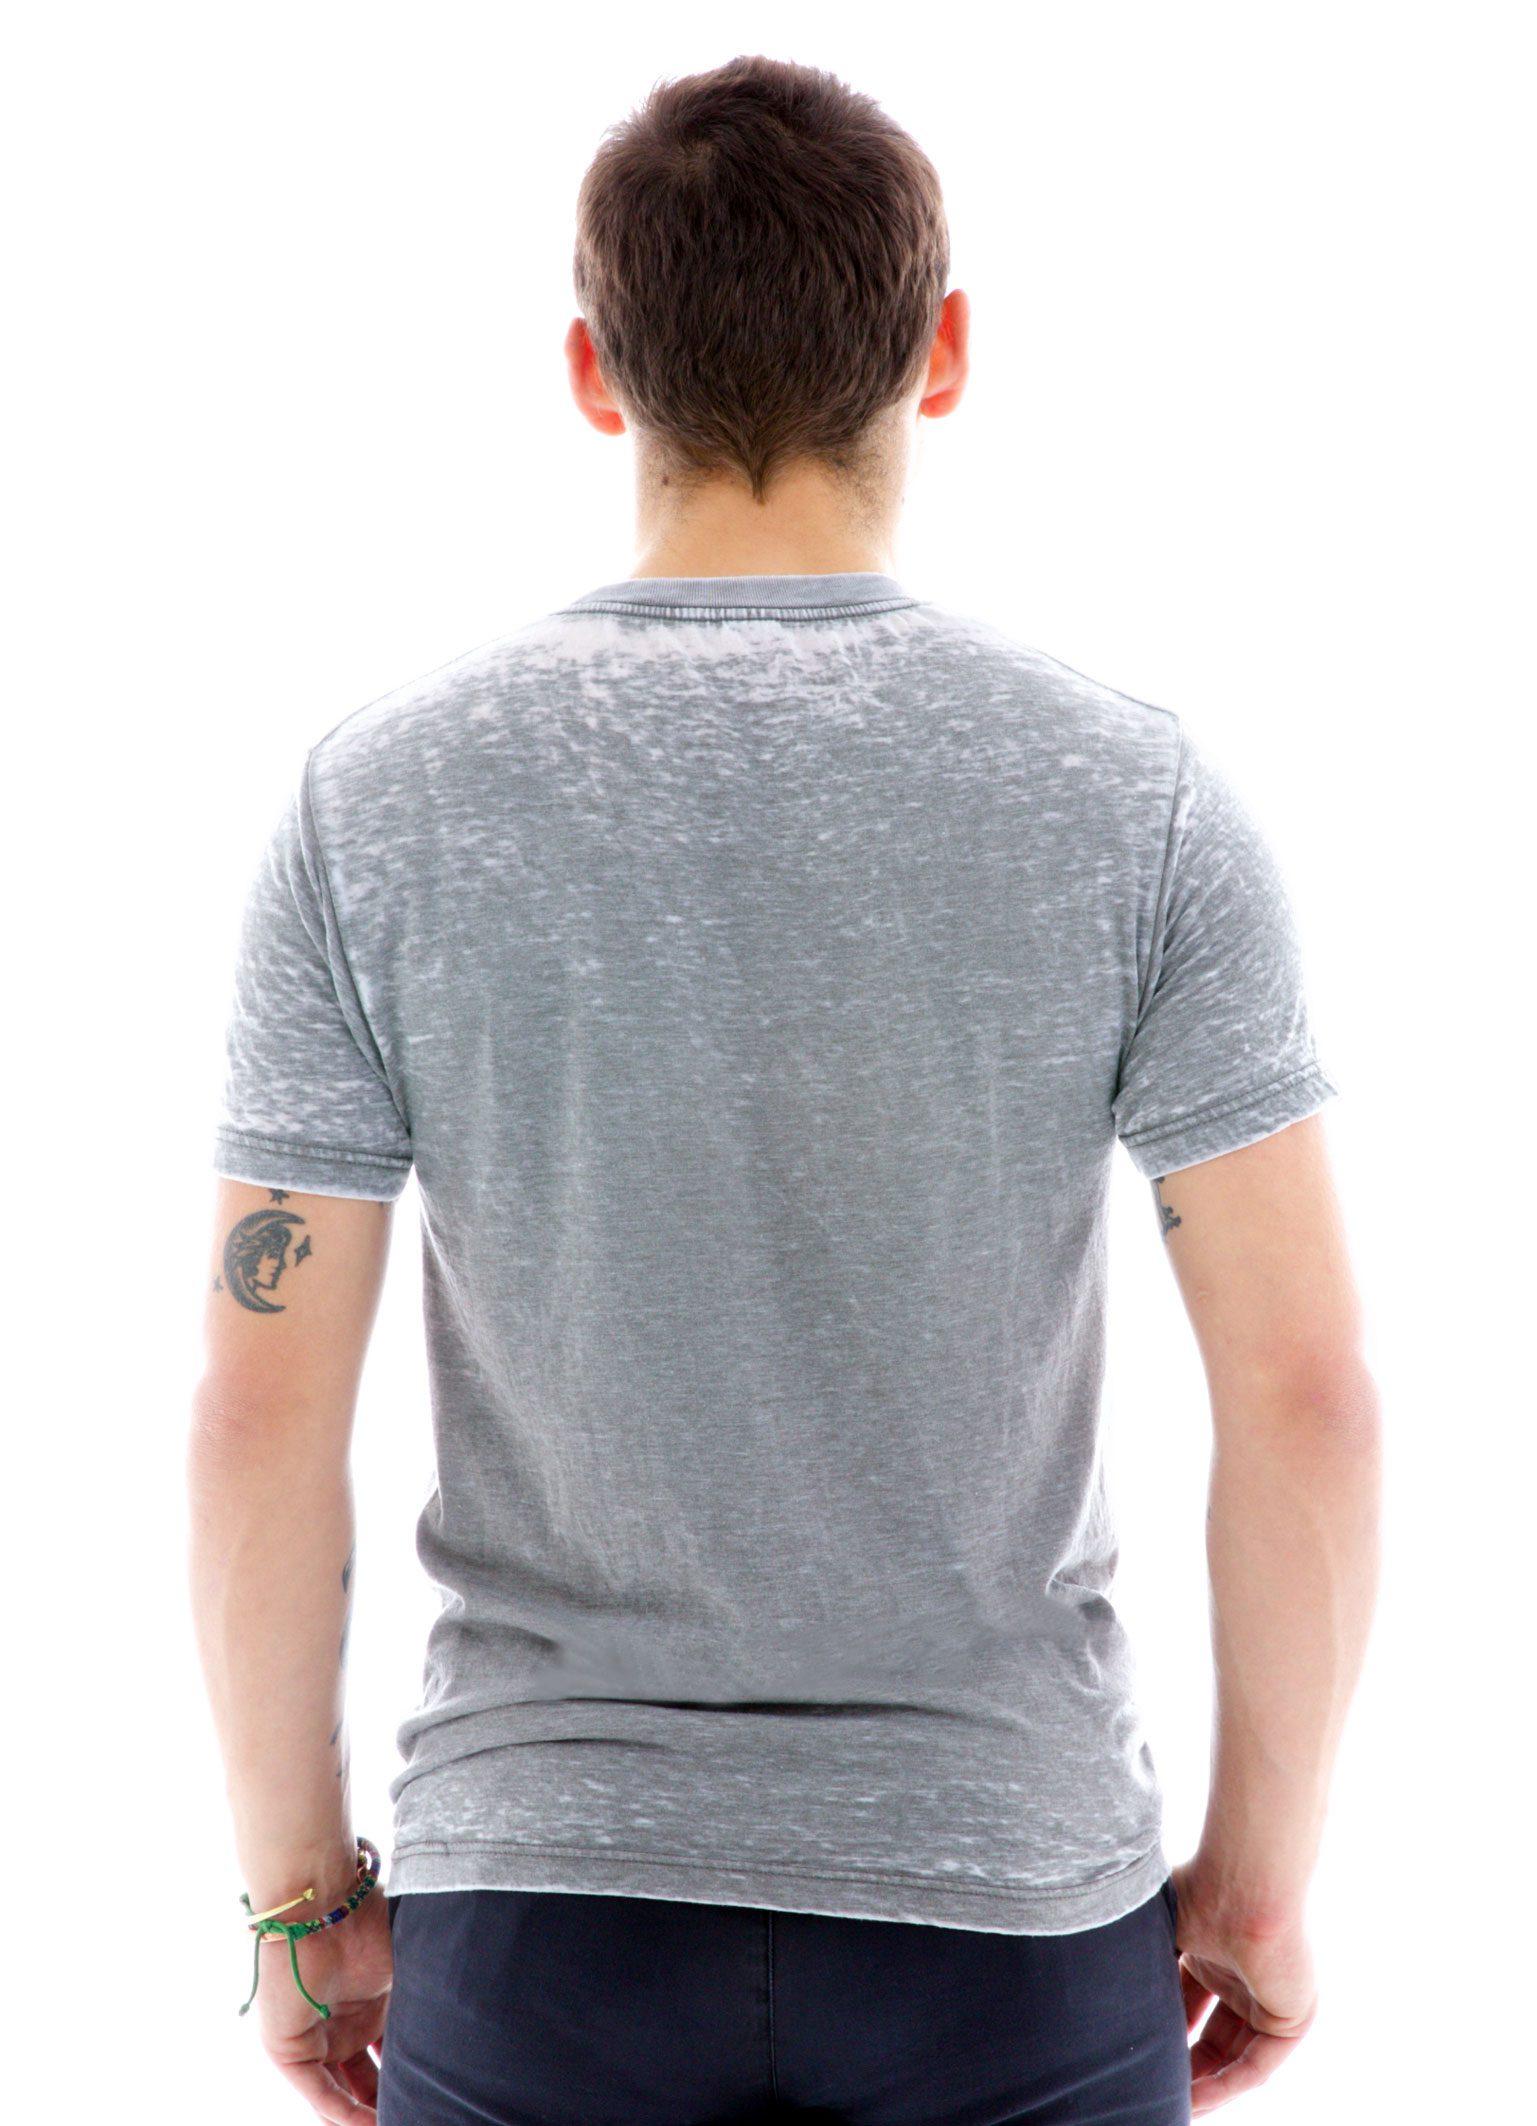 Burnout Crew Short Sleeve T-Shirt Back View